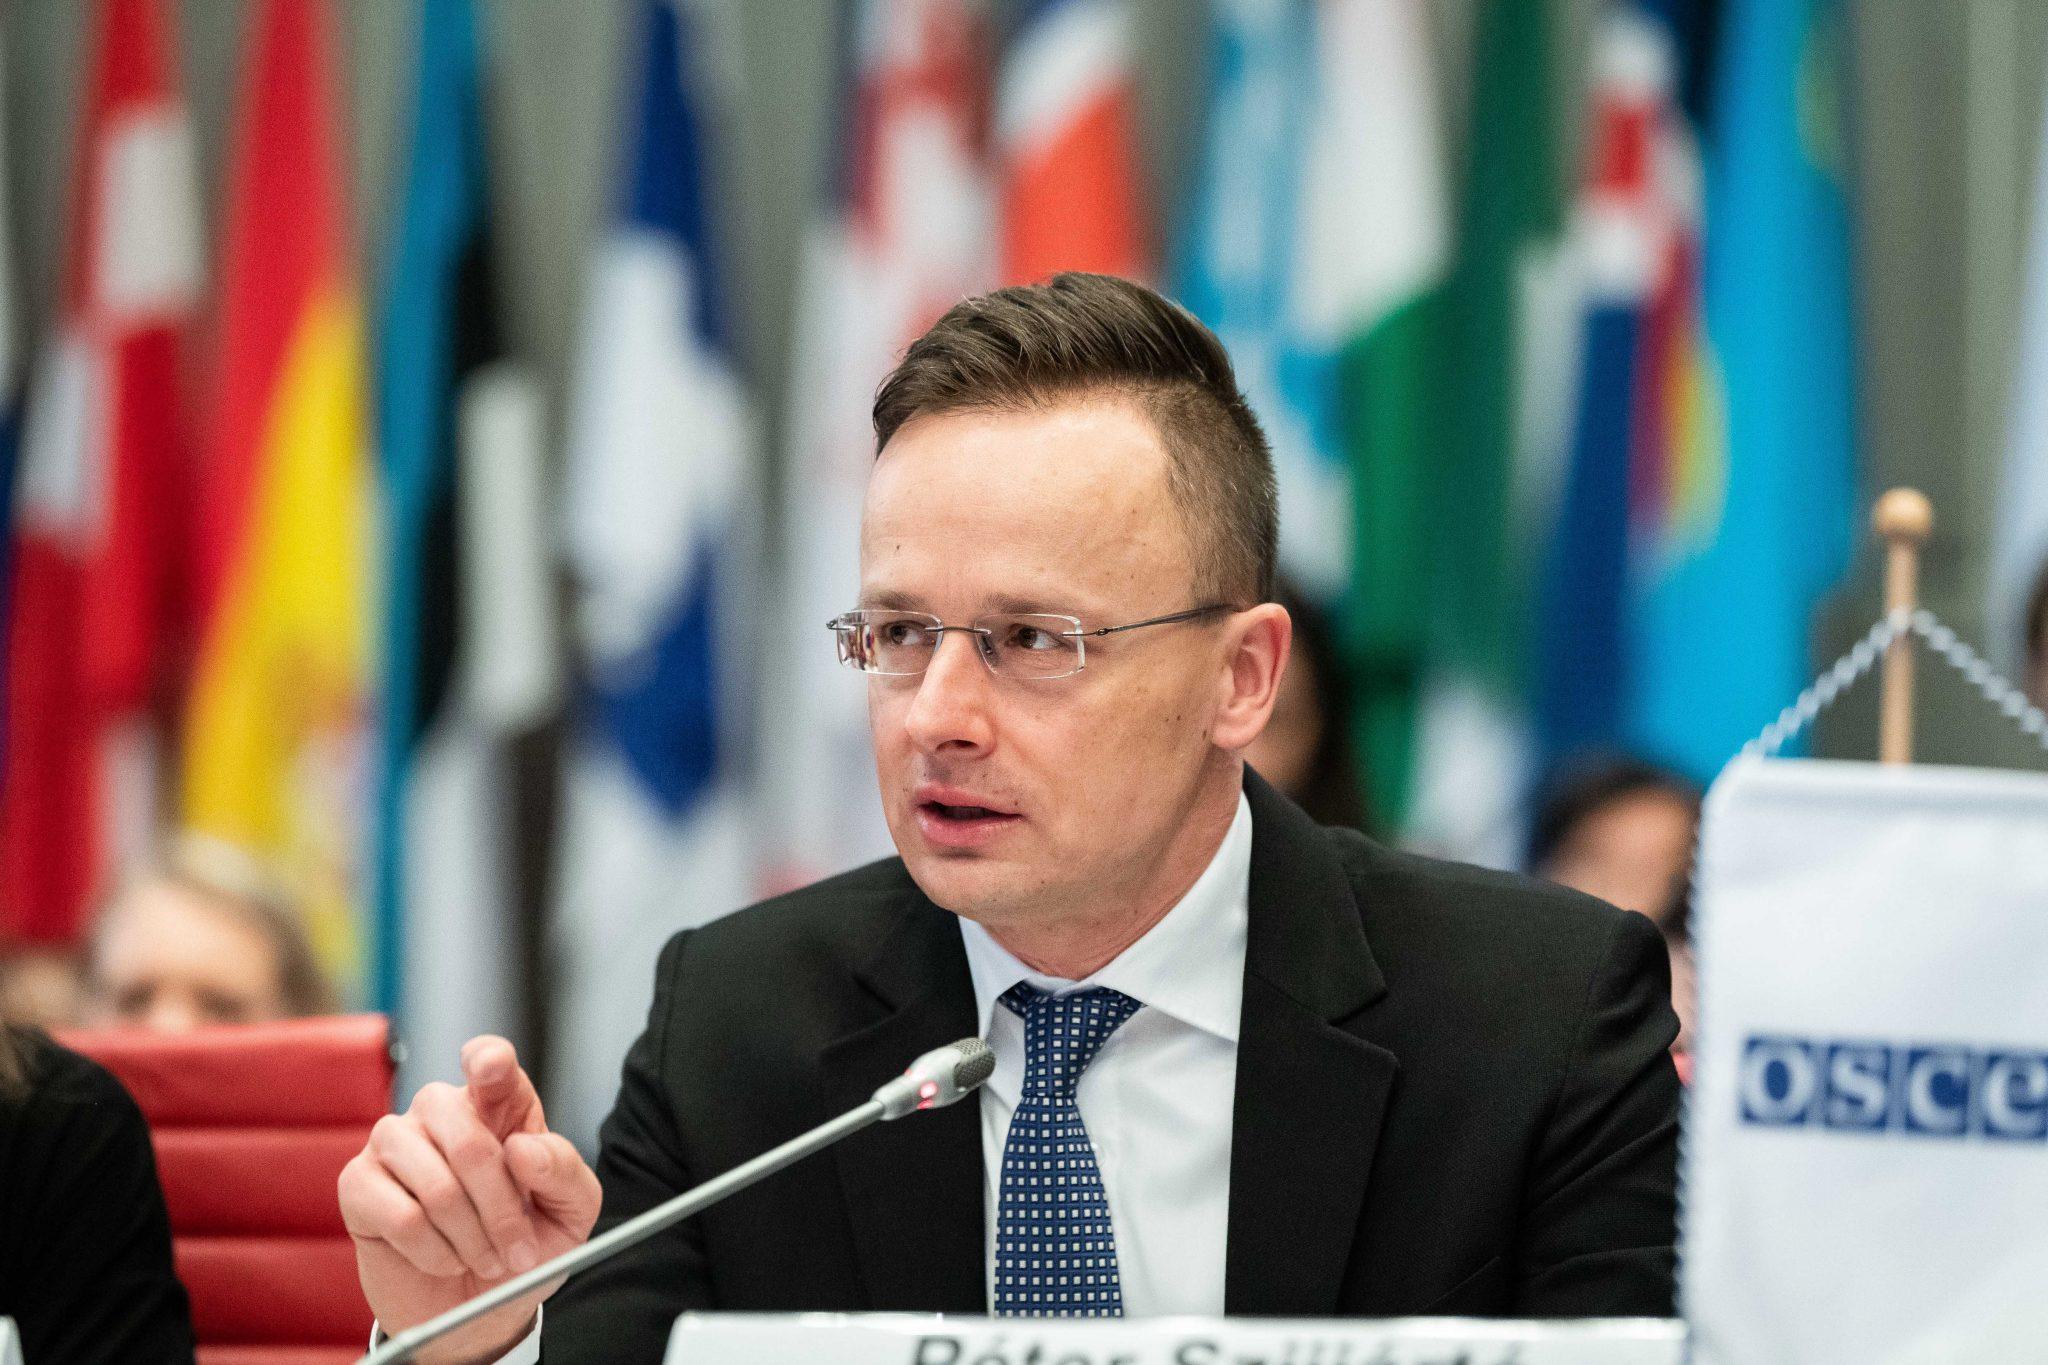 Szijjártó: UN Spending on Migration Instead of on Counter-terrorism 'Untenable' post's picture